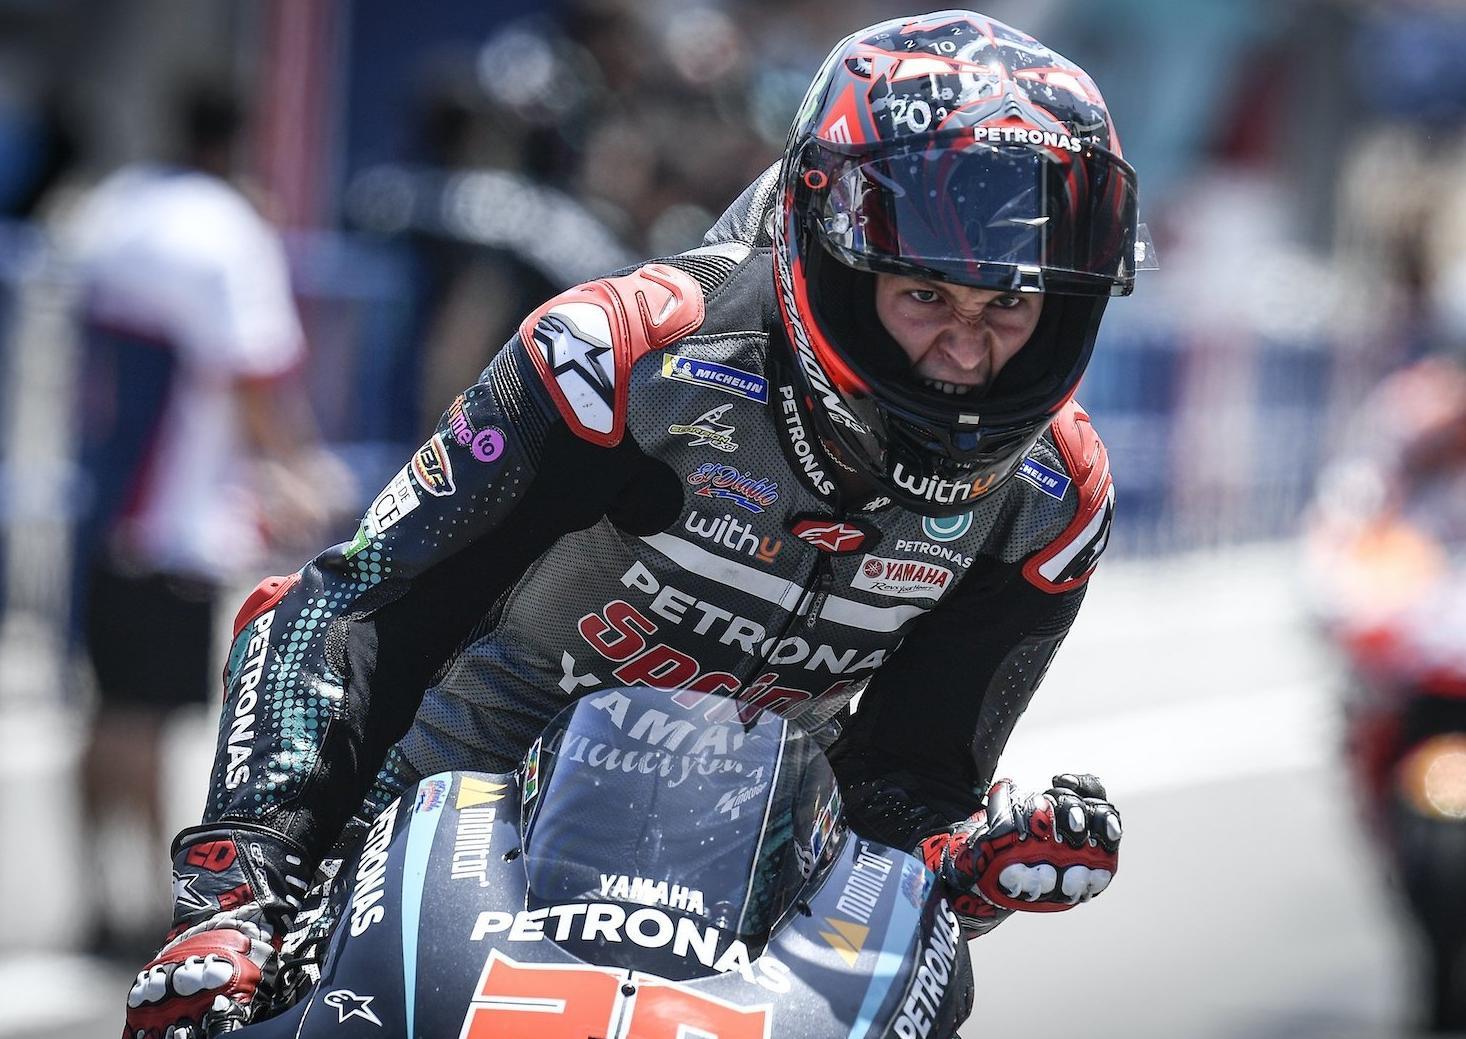 Maiden Motogp Victory For Fabio Quartararo At Jerez As Reigning Champion Marc Marquez Breaks Arm In Crash Belfast News Letter